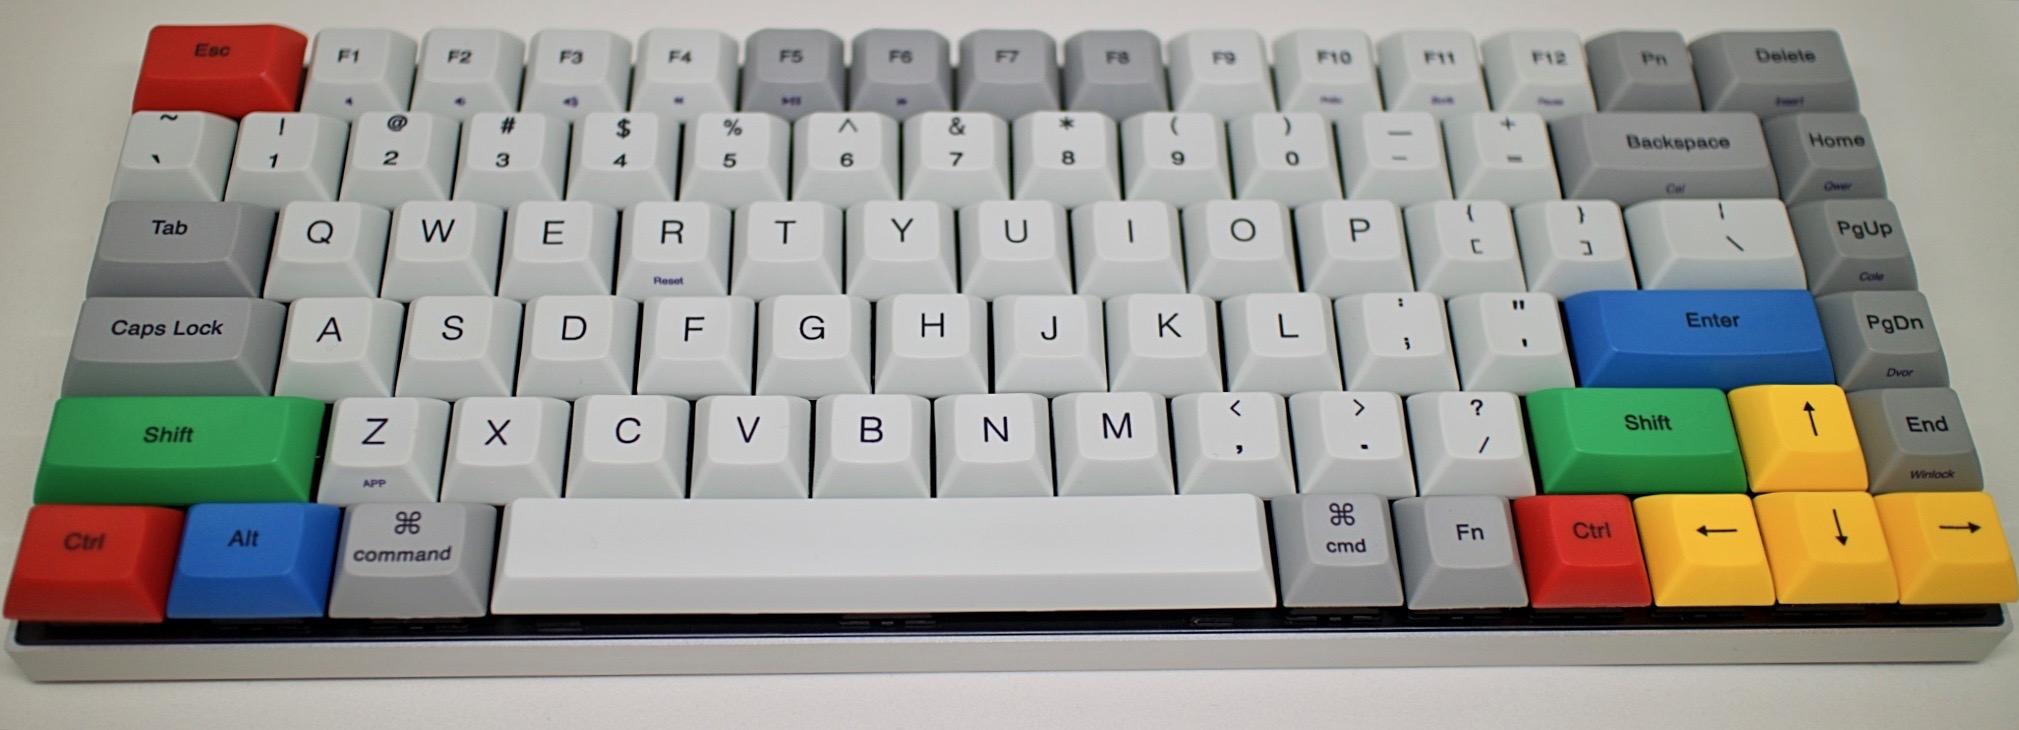 Vortex Race 3 Mechanical Keyboard Review - Leaf&Core